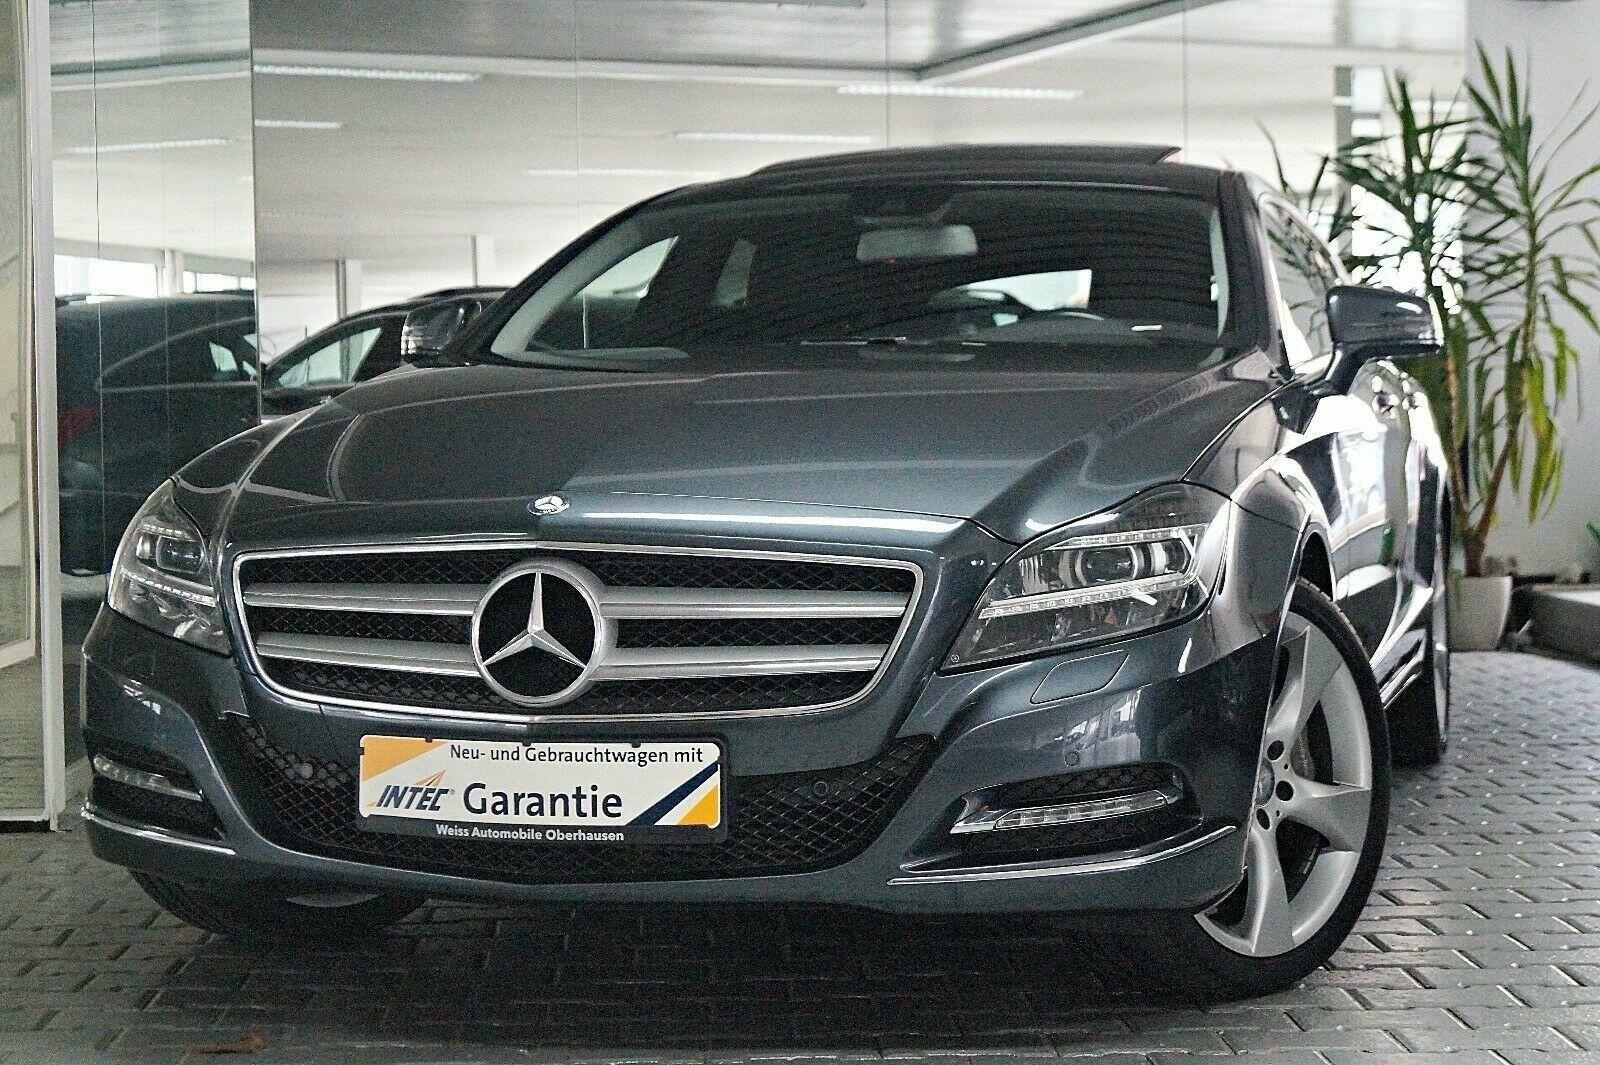 Mercedes CLS350 3,0 BlueTEC SB aut. 5d - 2.685 kr.